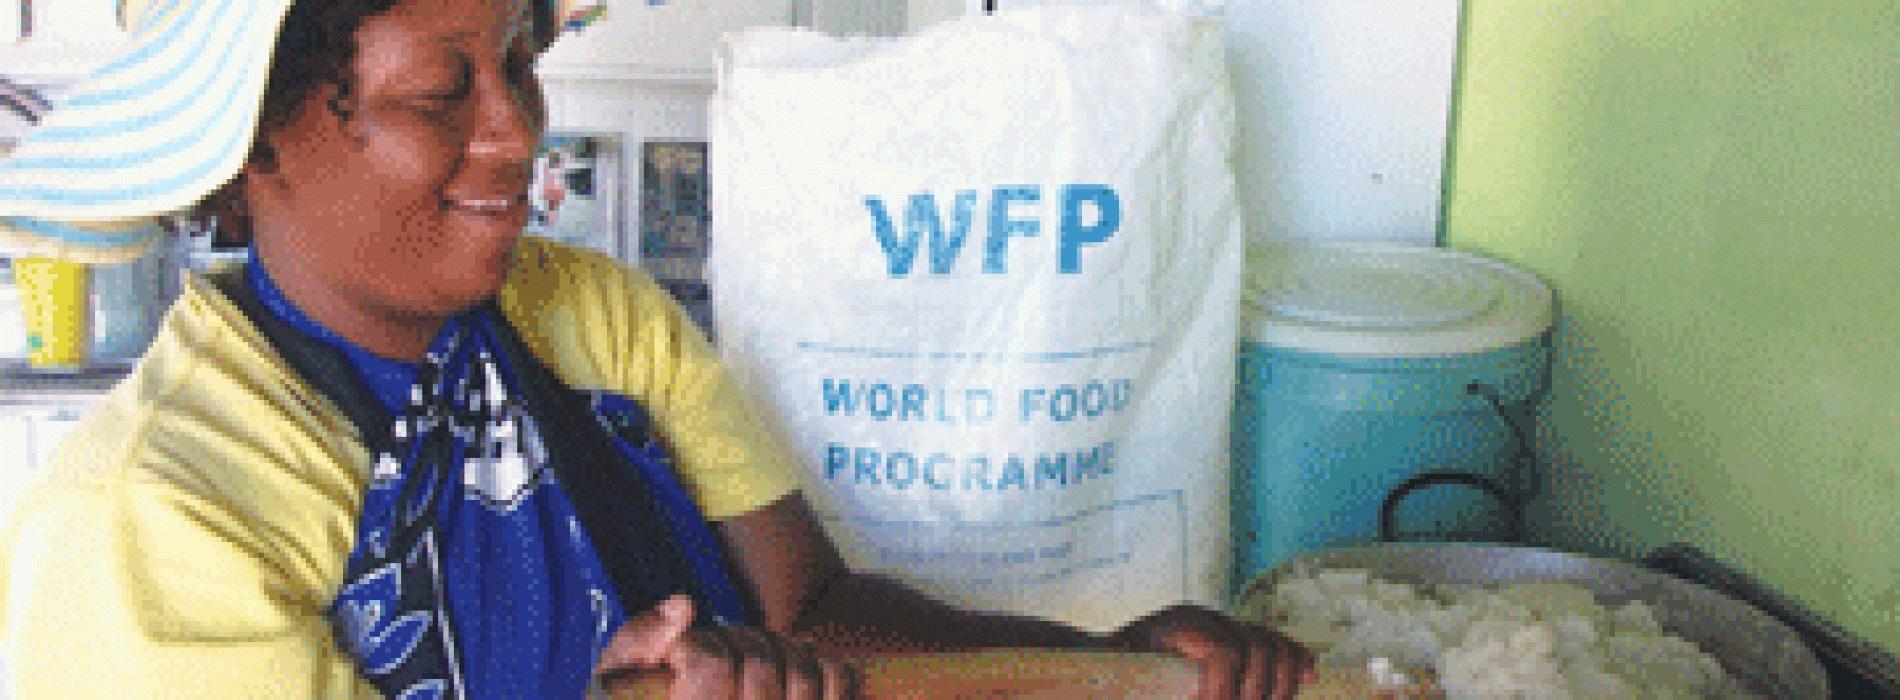 Feeding Lesotho's poor